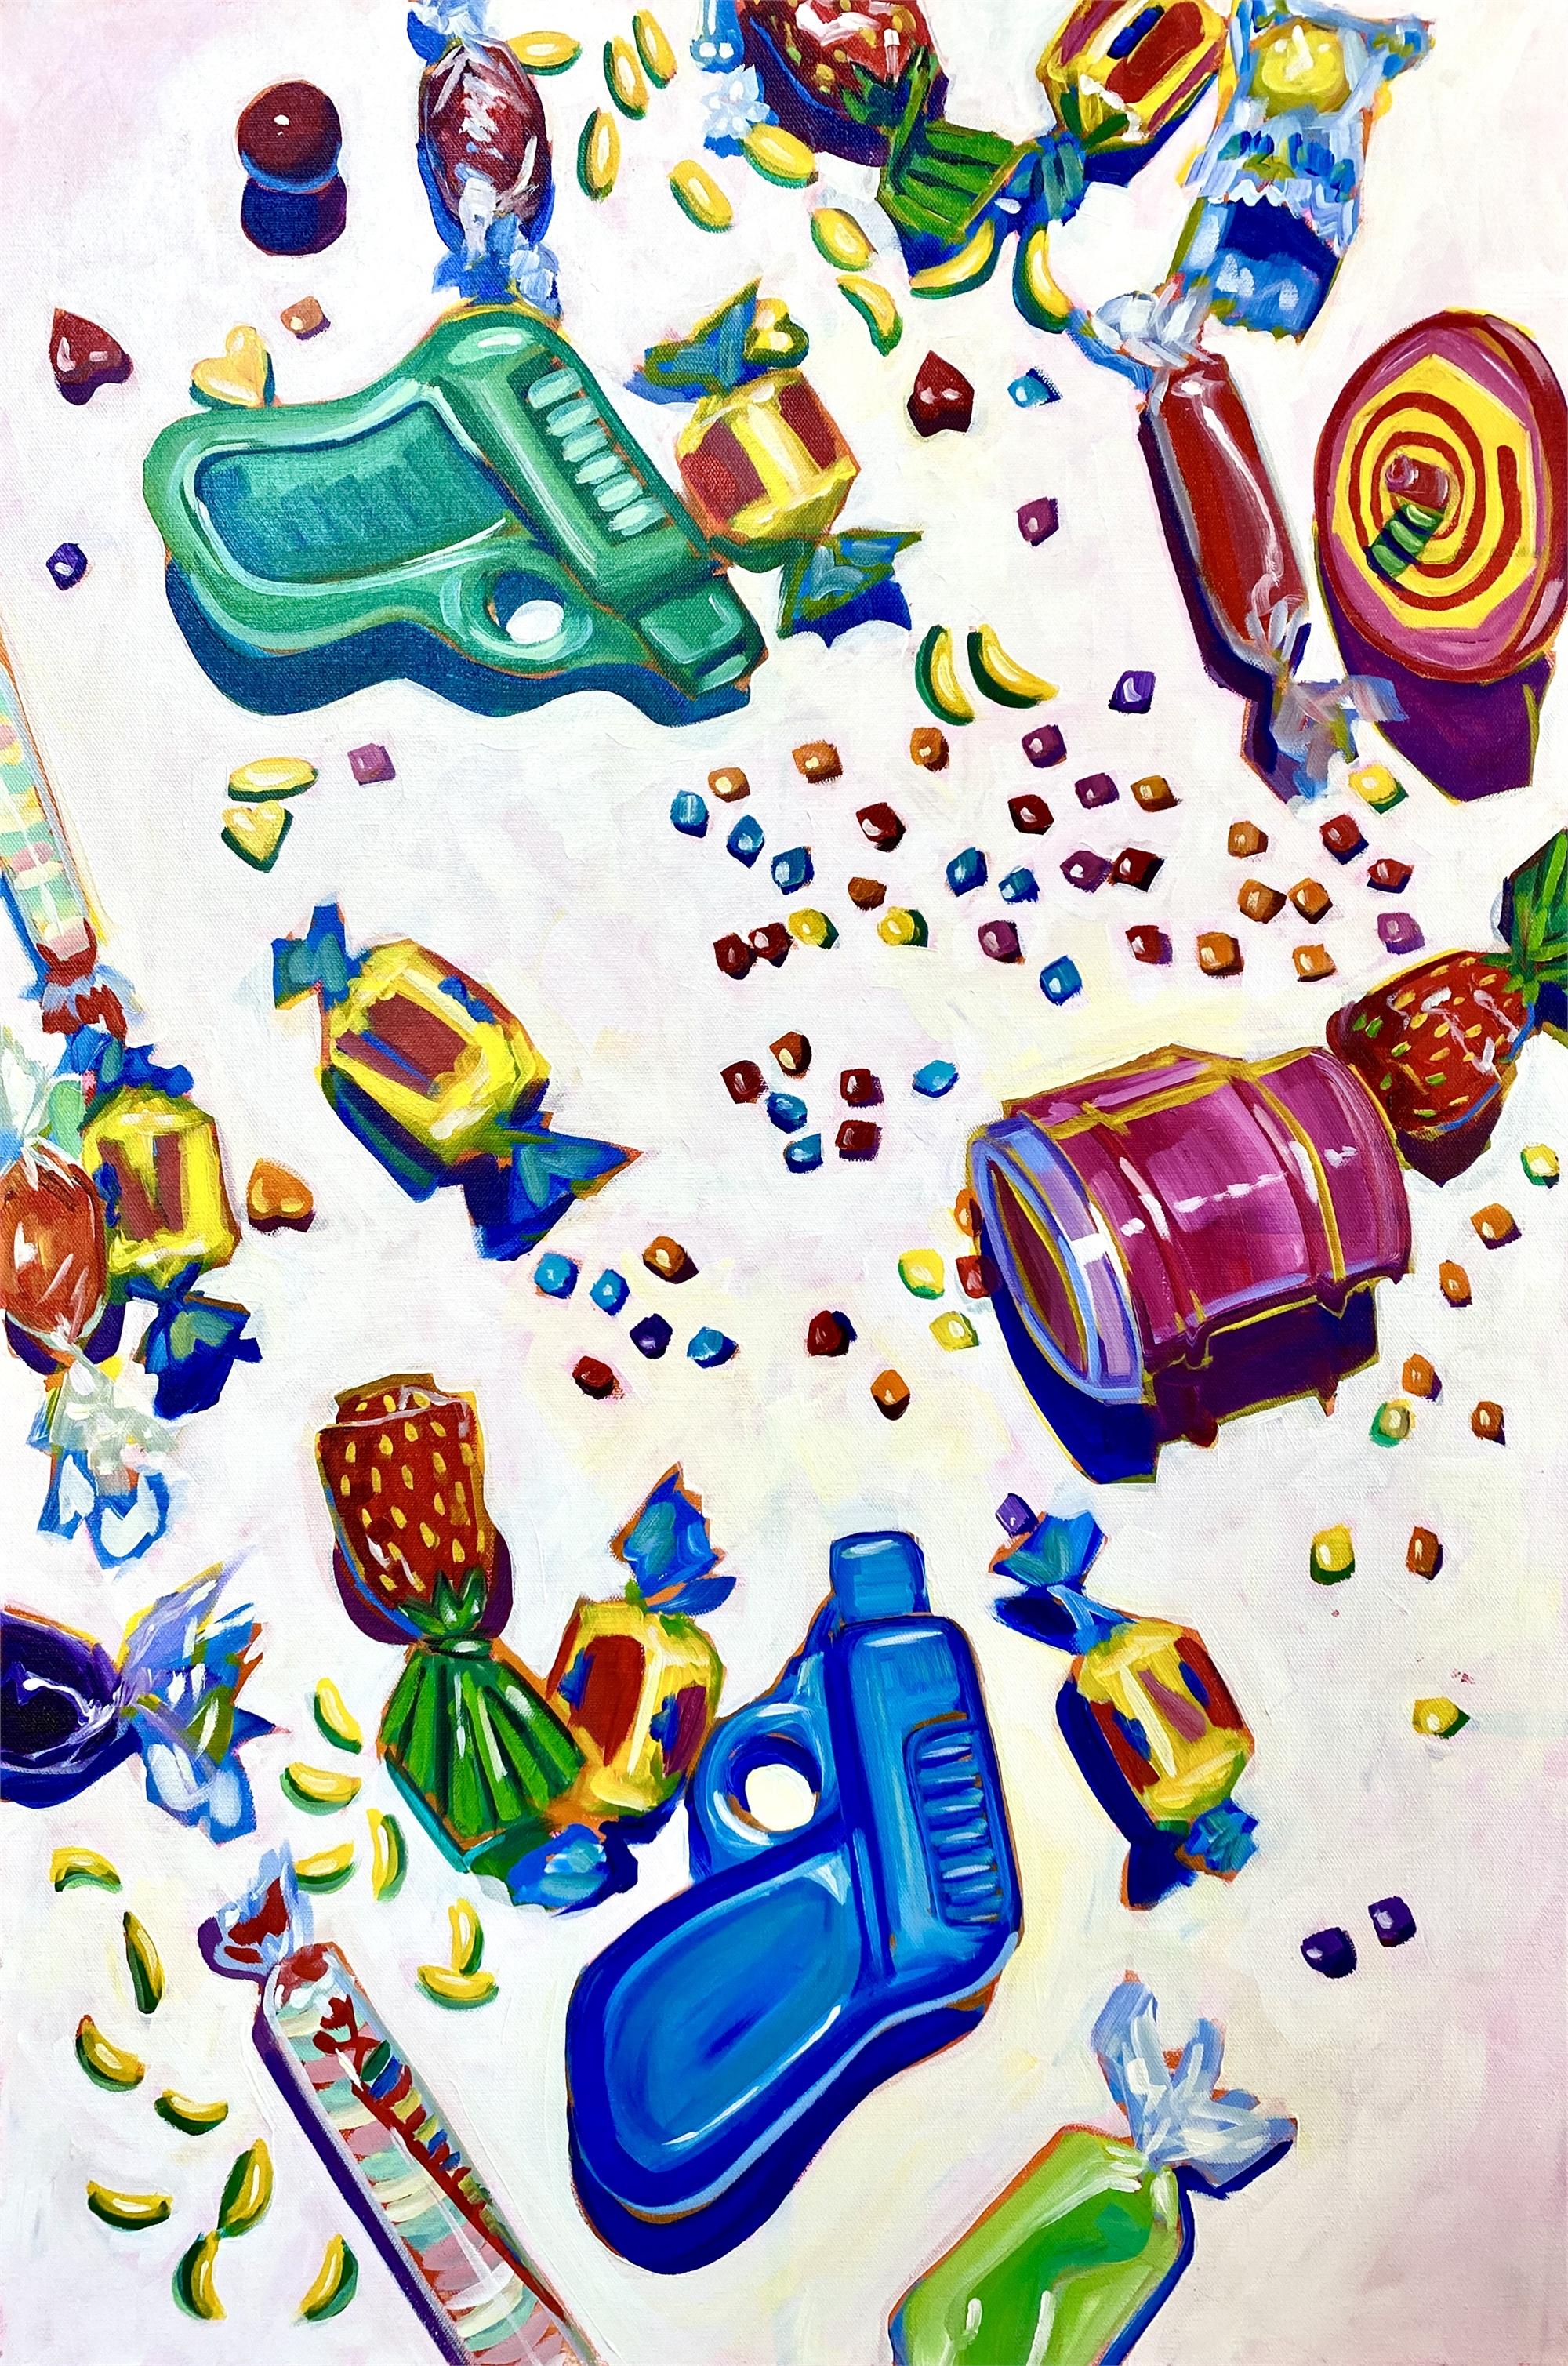 Piñata Party by Sari Shryack